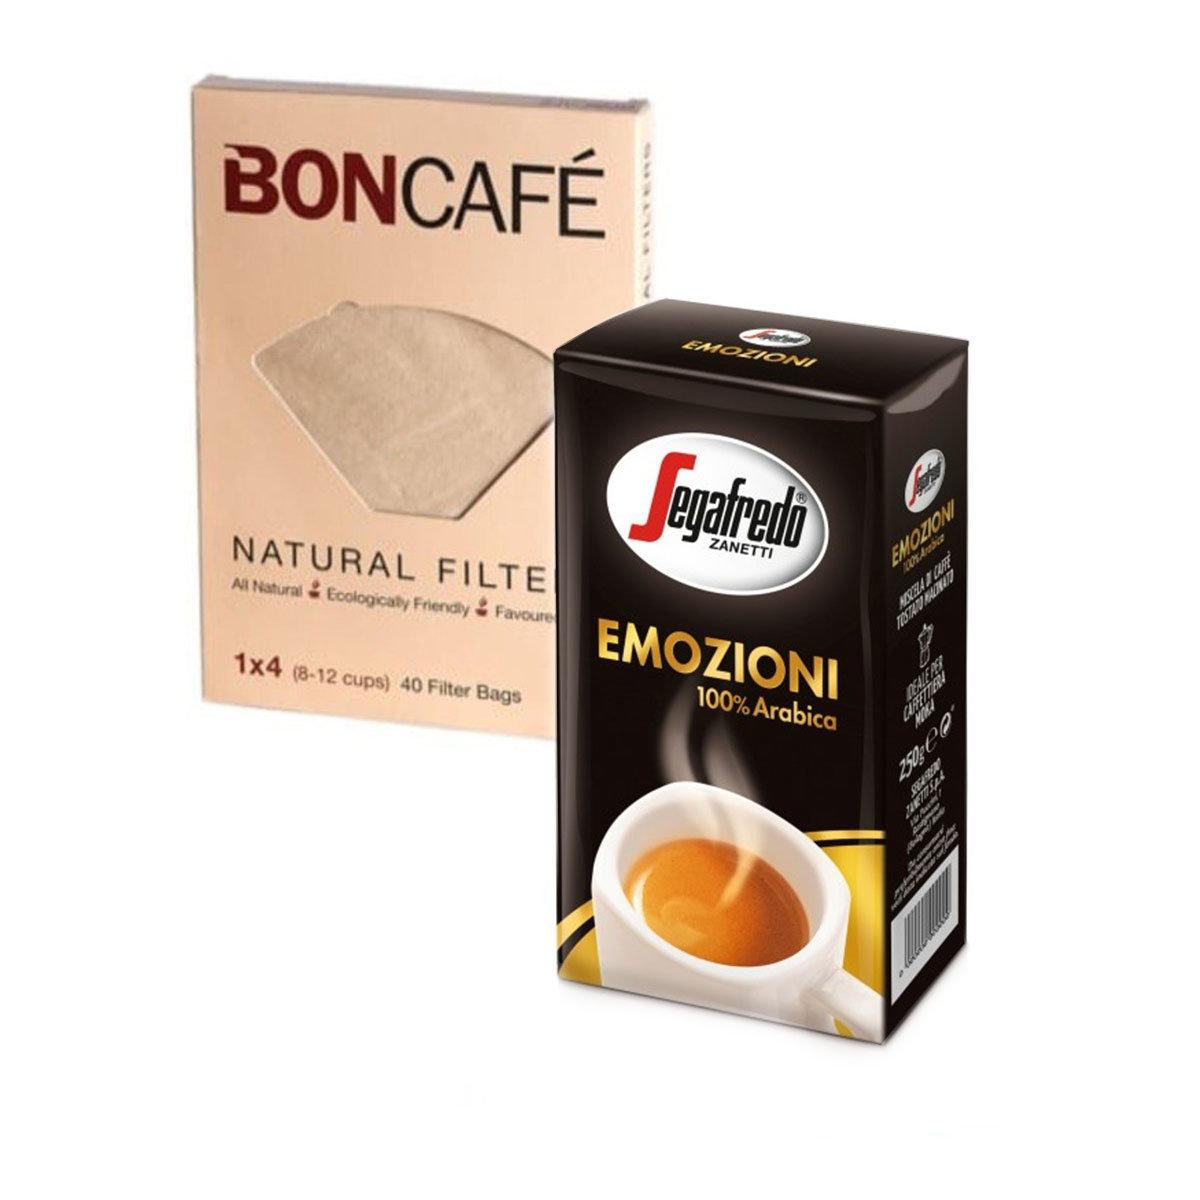 (100% Arabica) Emozioni Ground Coffee (Expiry: 06/2021) + 純天然咖啡濾紙 1x4 (40張)